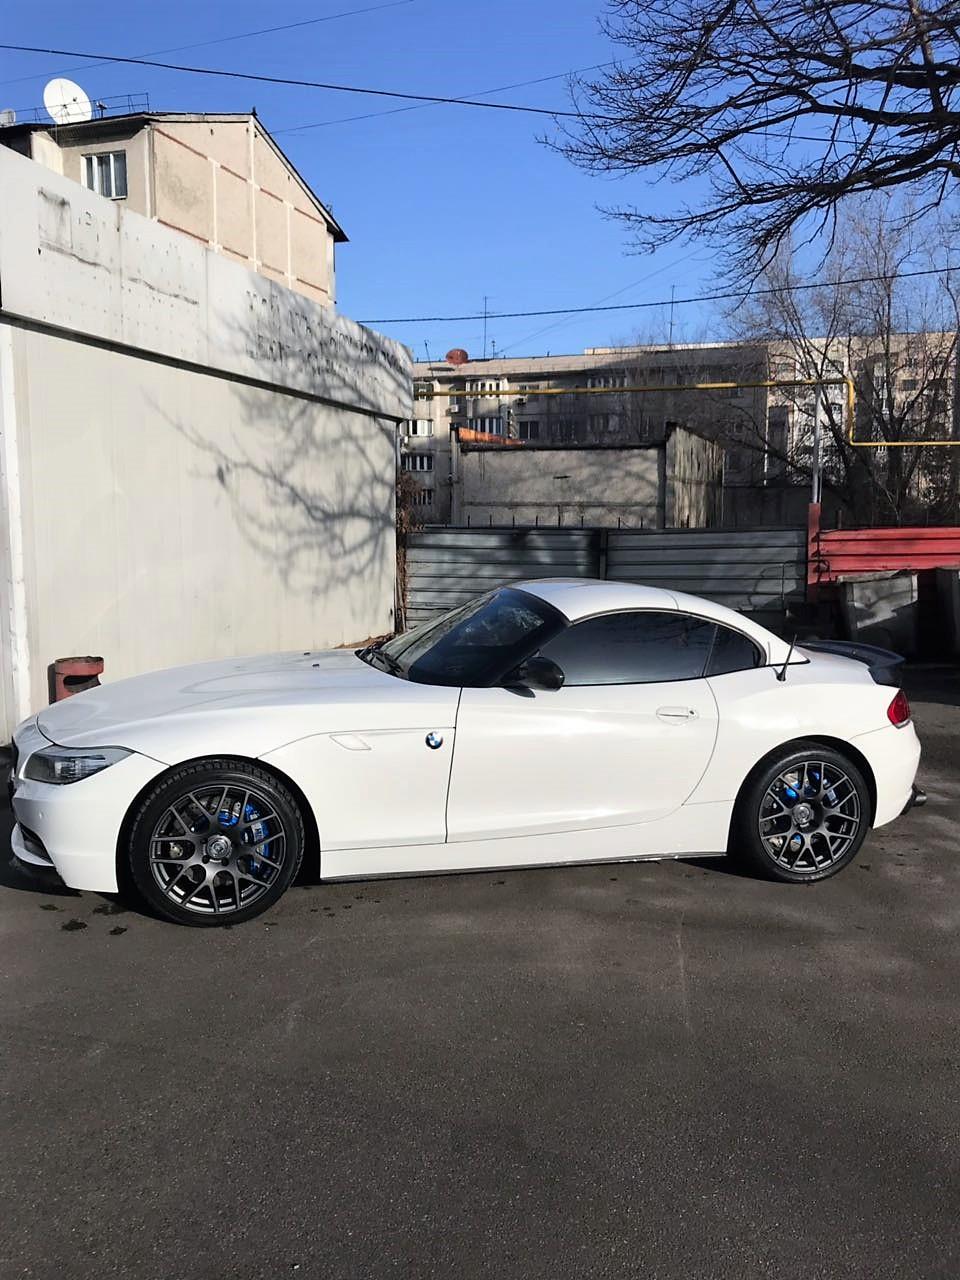 Замена тормозов на BMW Z4 sDrive 35is E89. Ставим HP-Brakes.